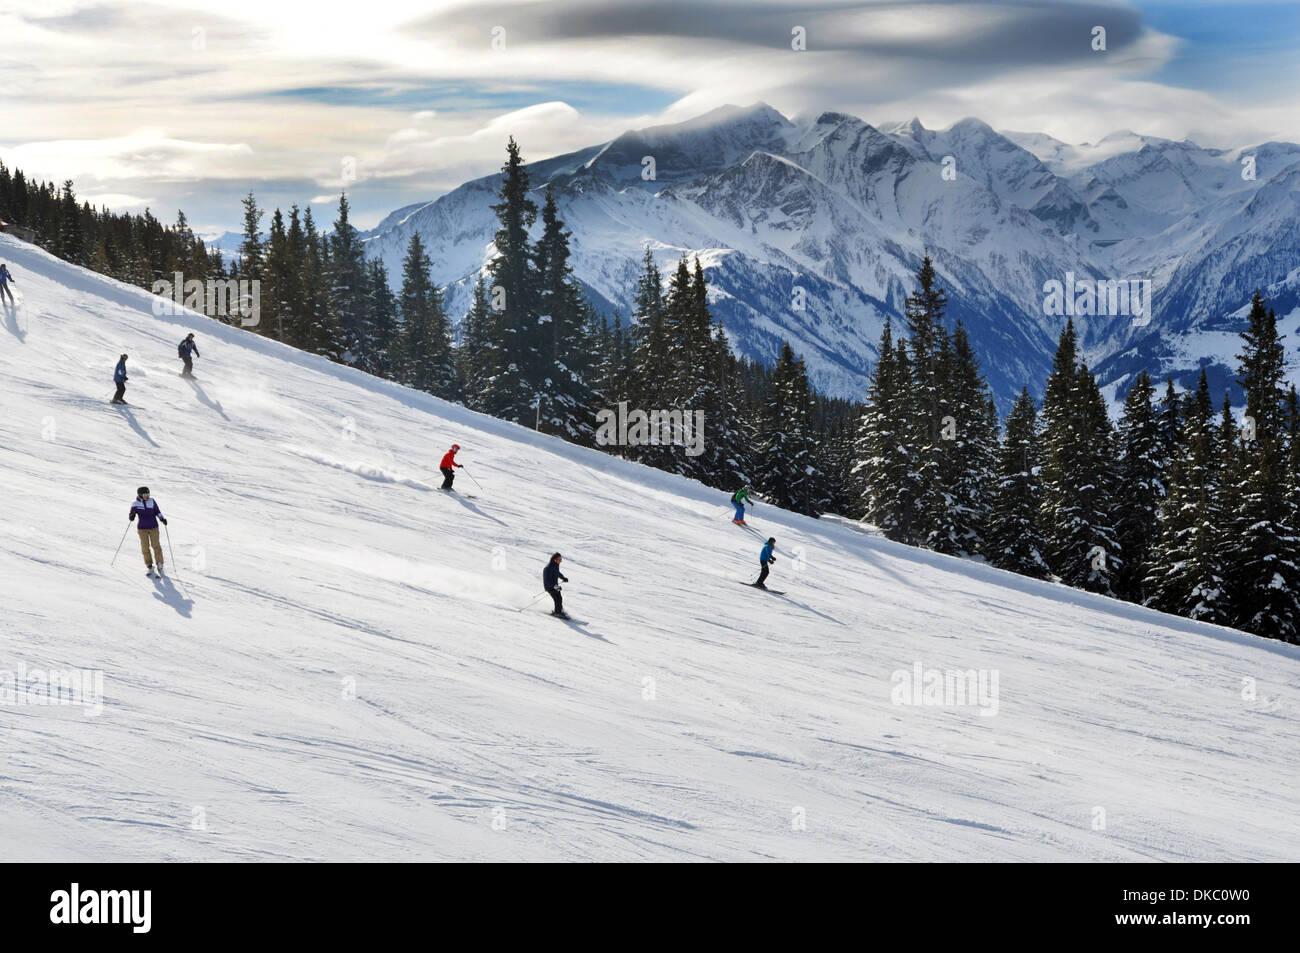 Ski resort landscape, Austrian Alps - Stock Image